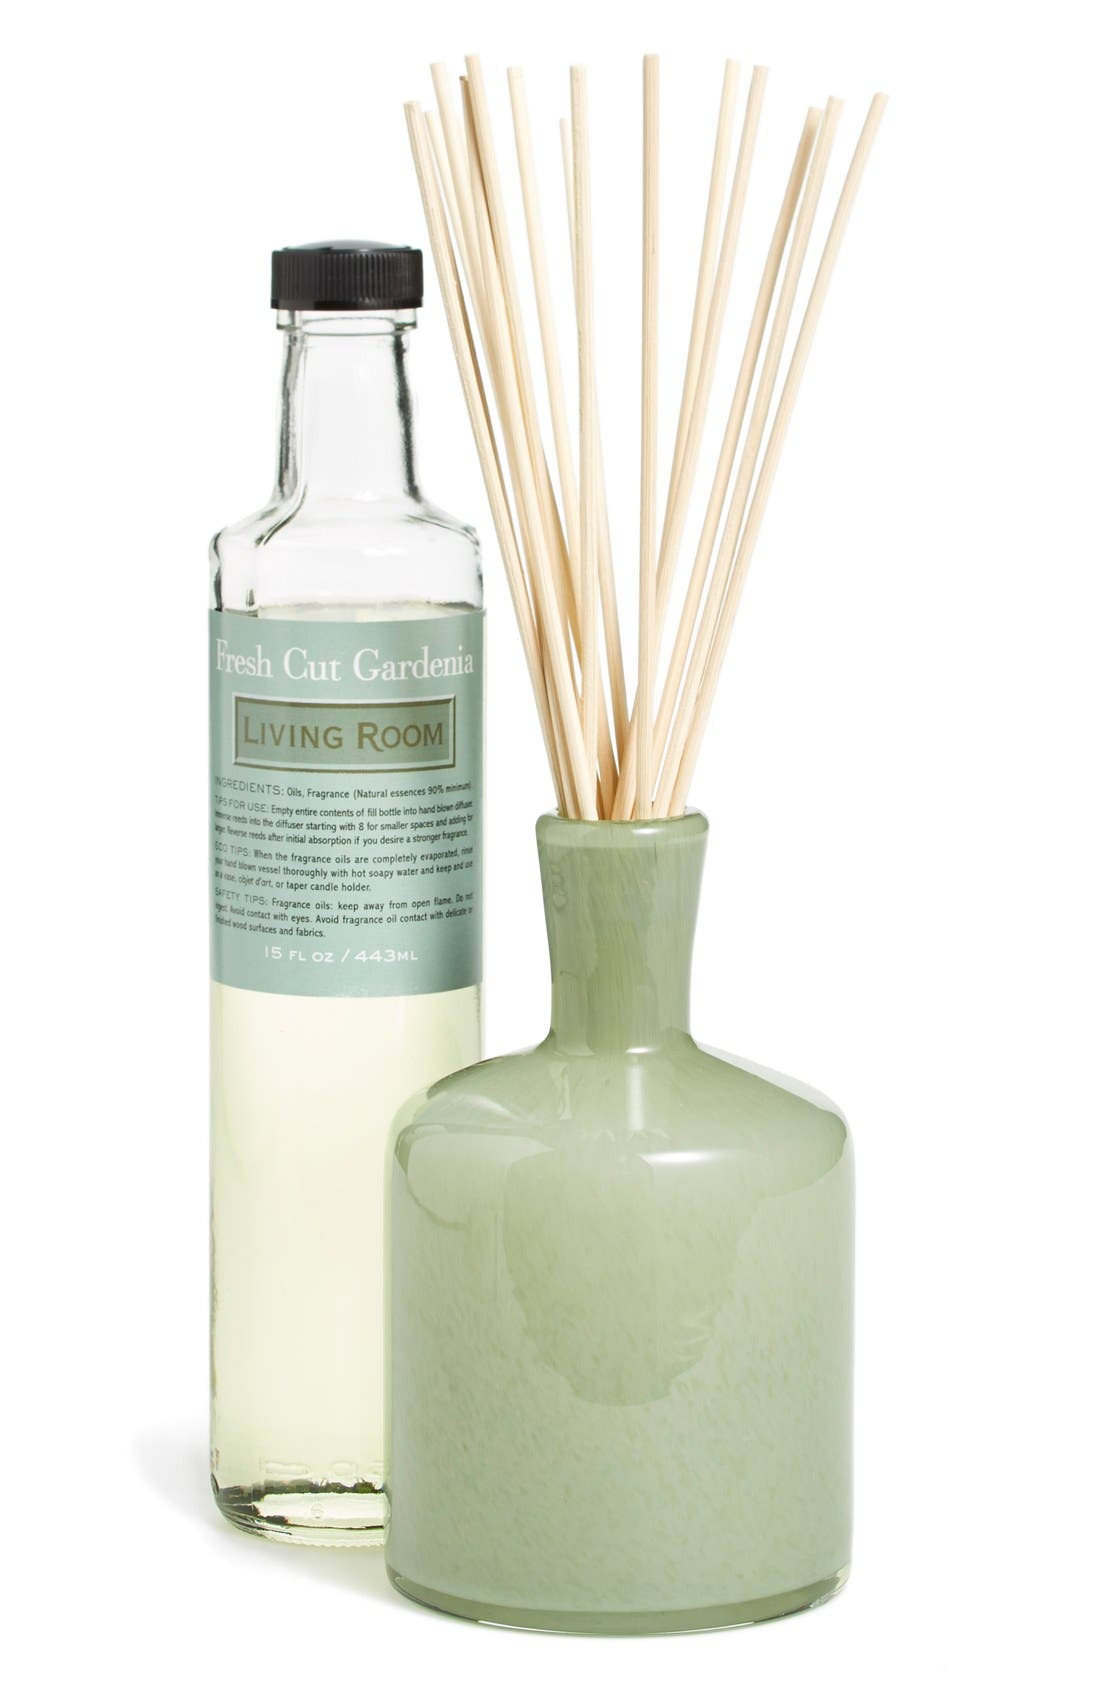 'Fresh Cut Gardenia - Living Room' Fragrance Diffuser,                             Main thumbnail 1, color,                             NO COLOR